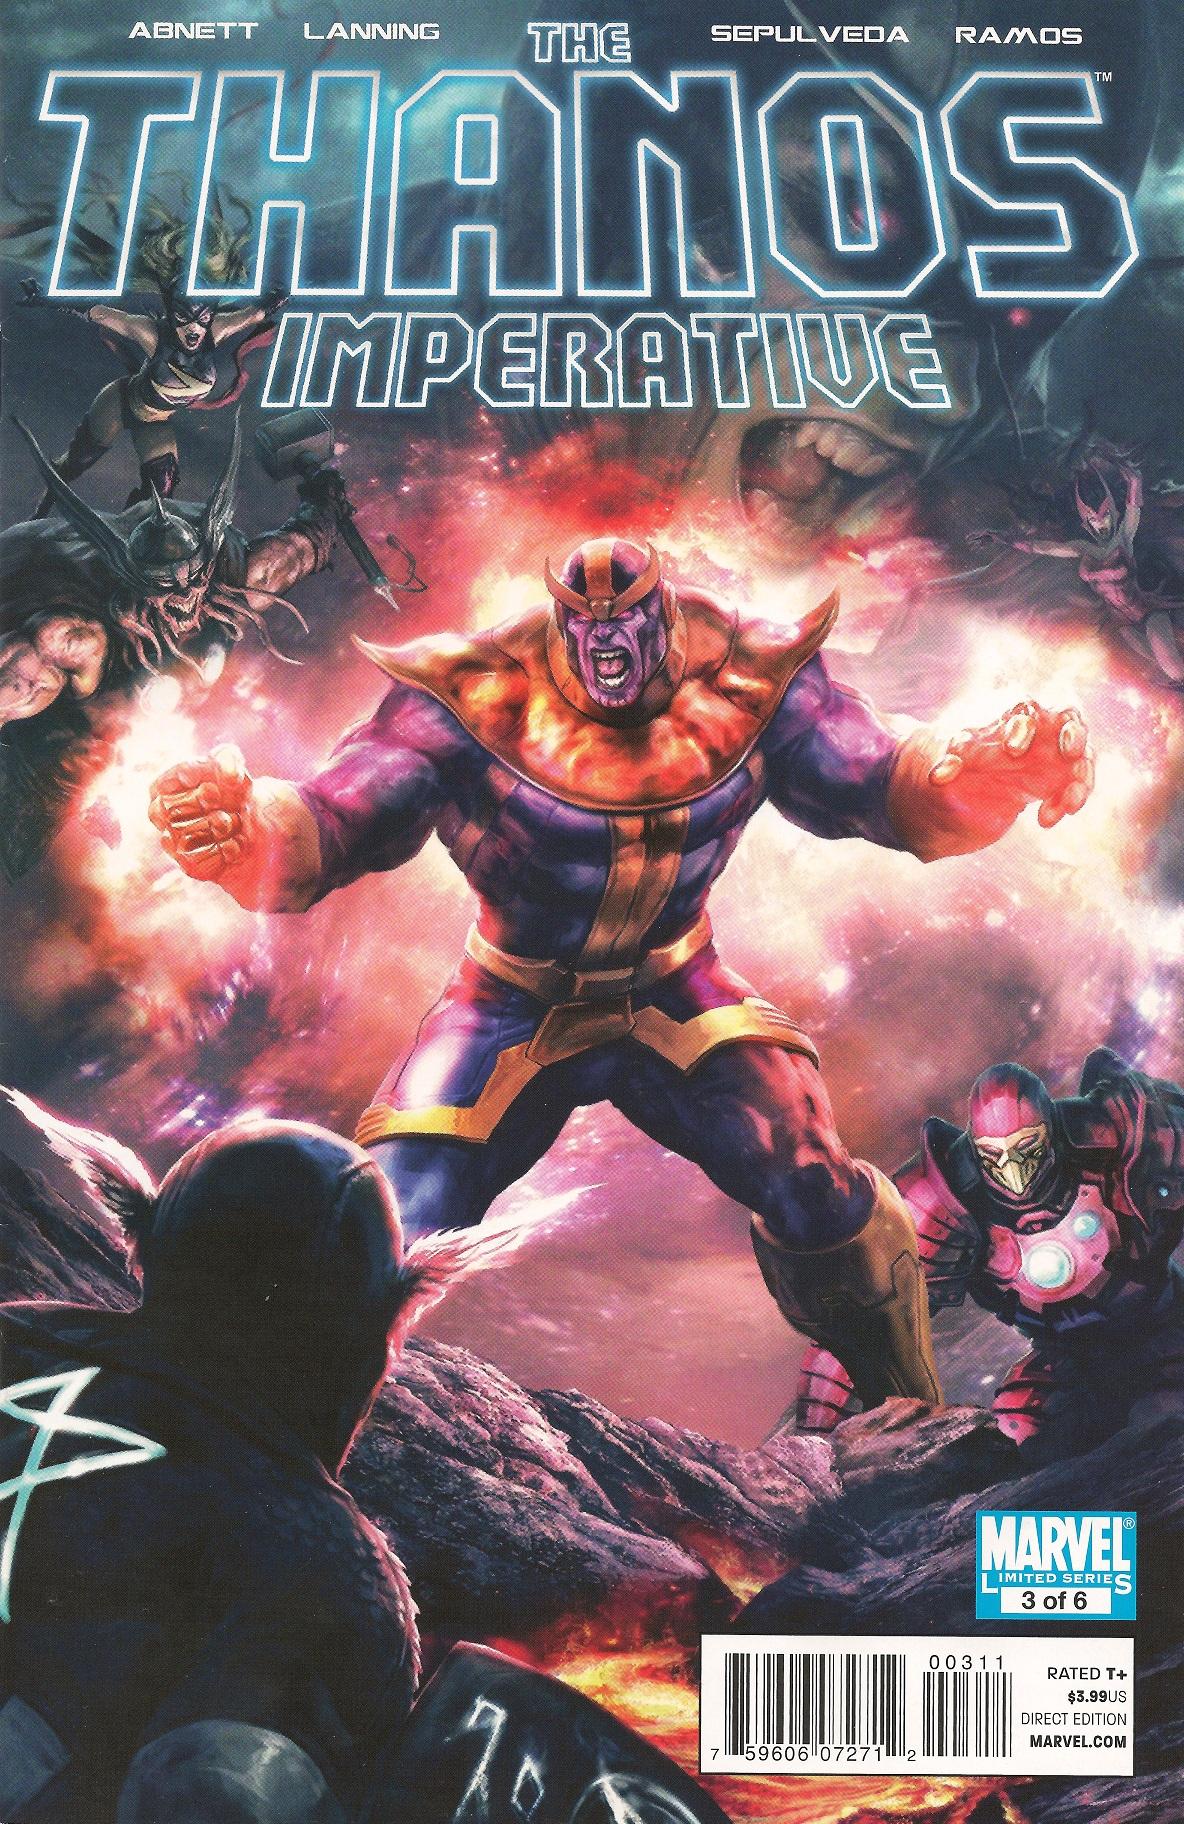 Thanos Imperative Vol 1 3 | Marvel Database | FANDOM ...